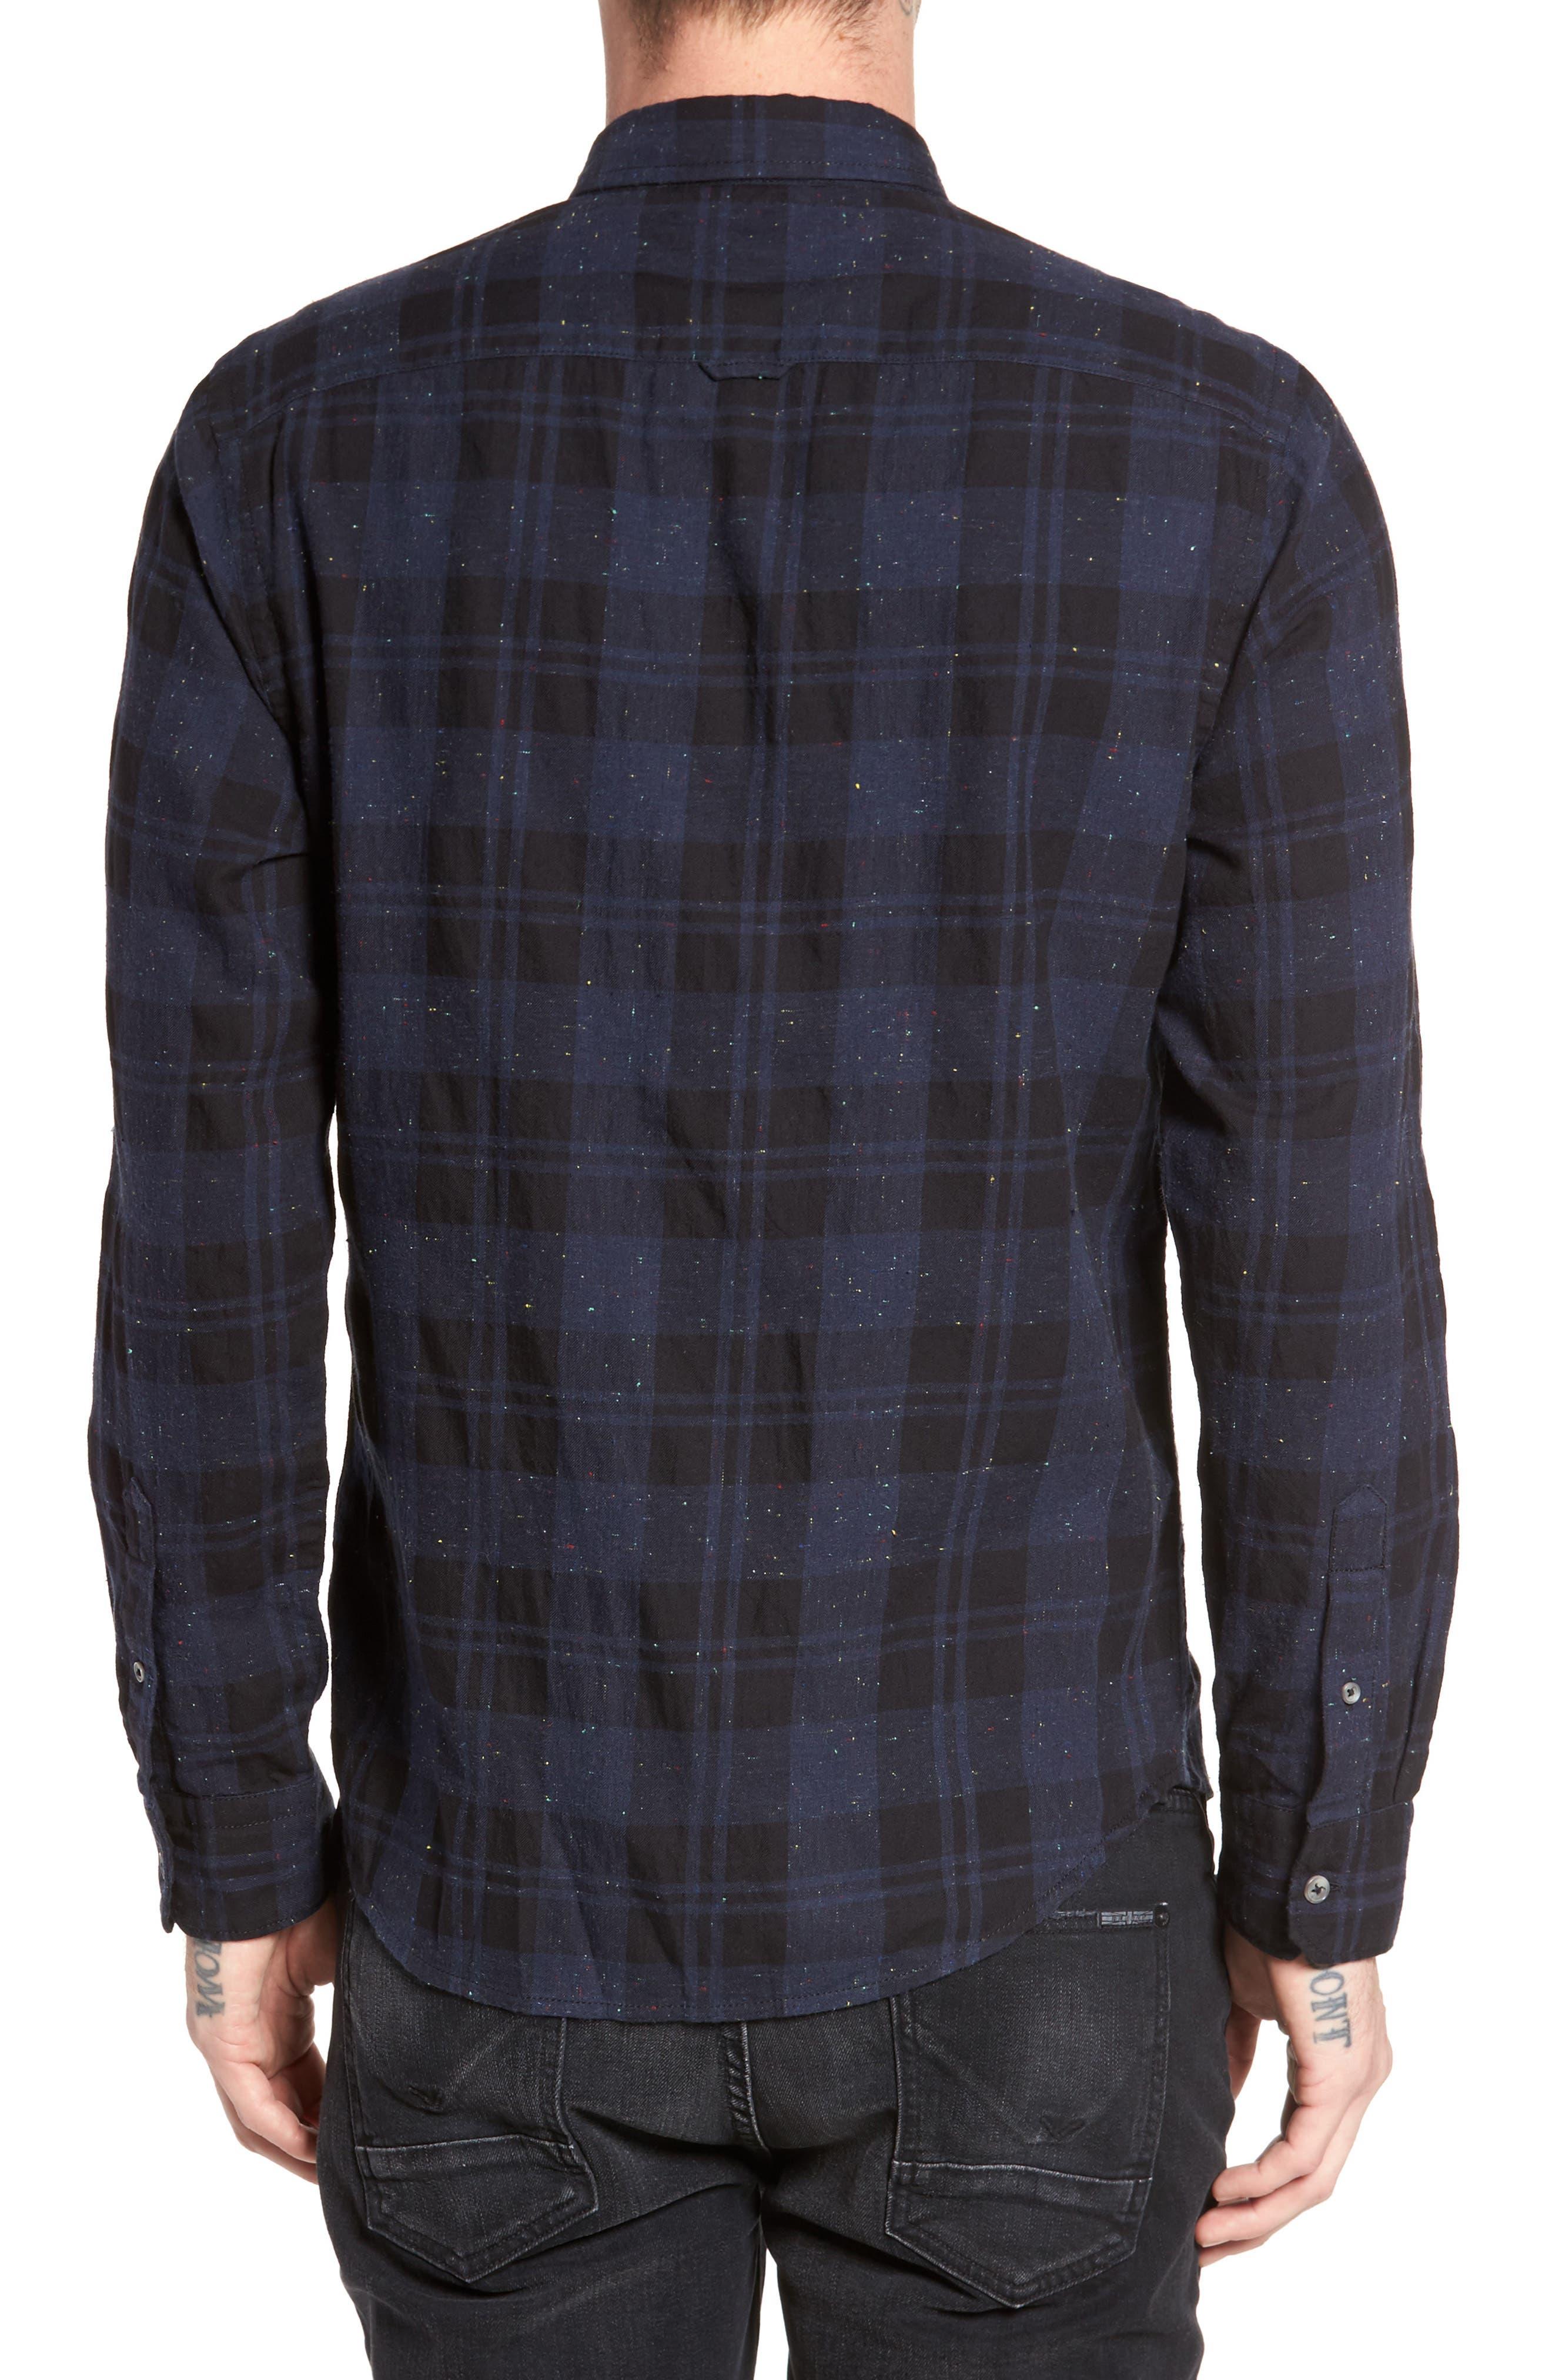 Long Sleeve Plaid Nep Shirt,                             Alternate thumbnail 2, color,                             Navy- Black Nepped Plaid